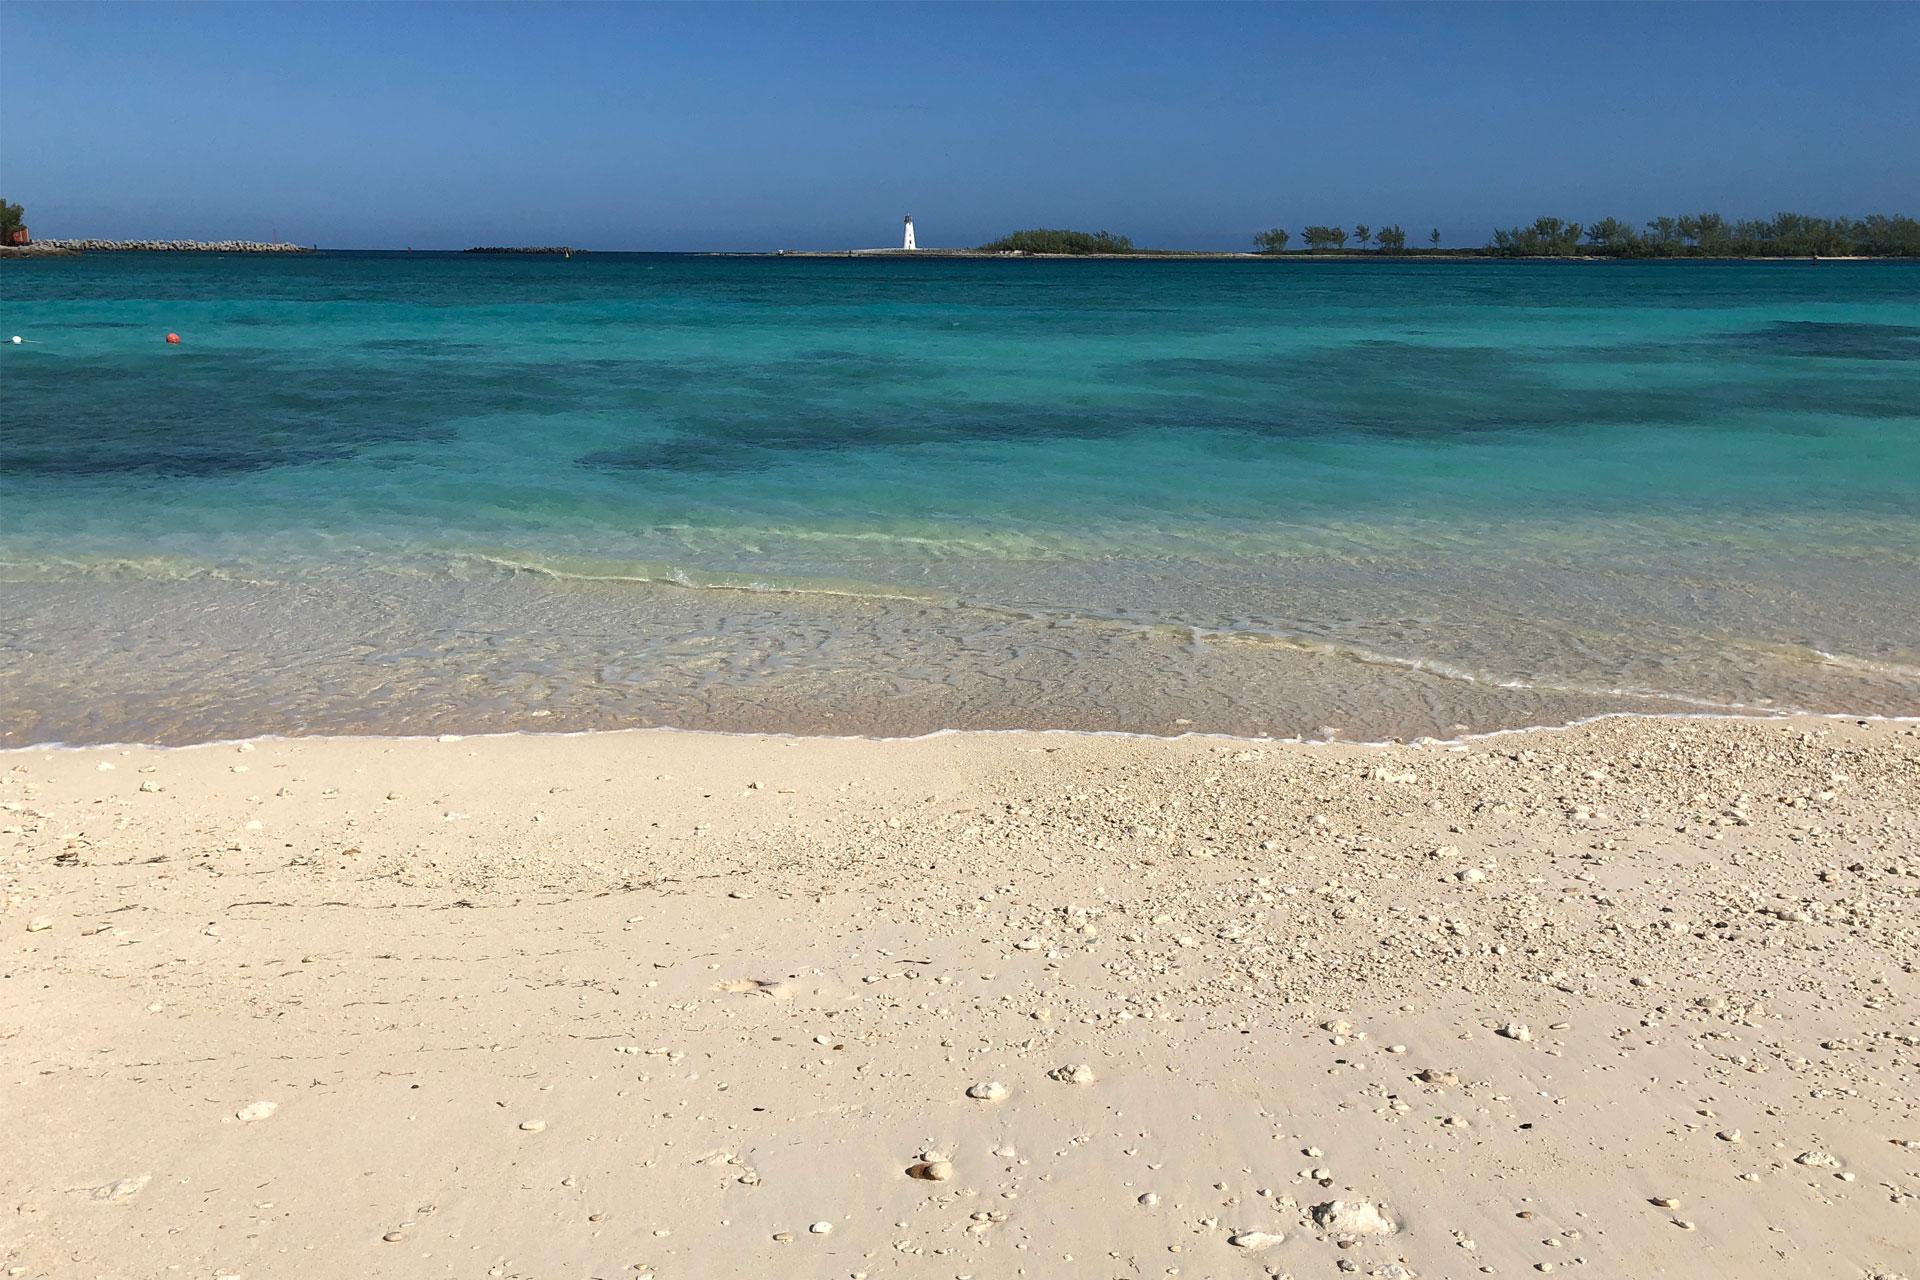 Junkanoo Beach in Nassau, Bahamas; Courtesy of Patrick Horton/Shutterstock.com